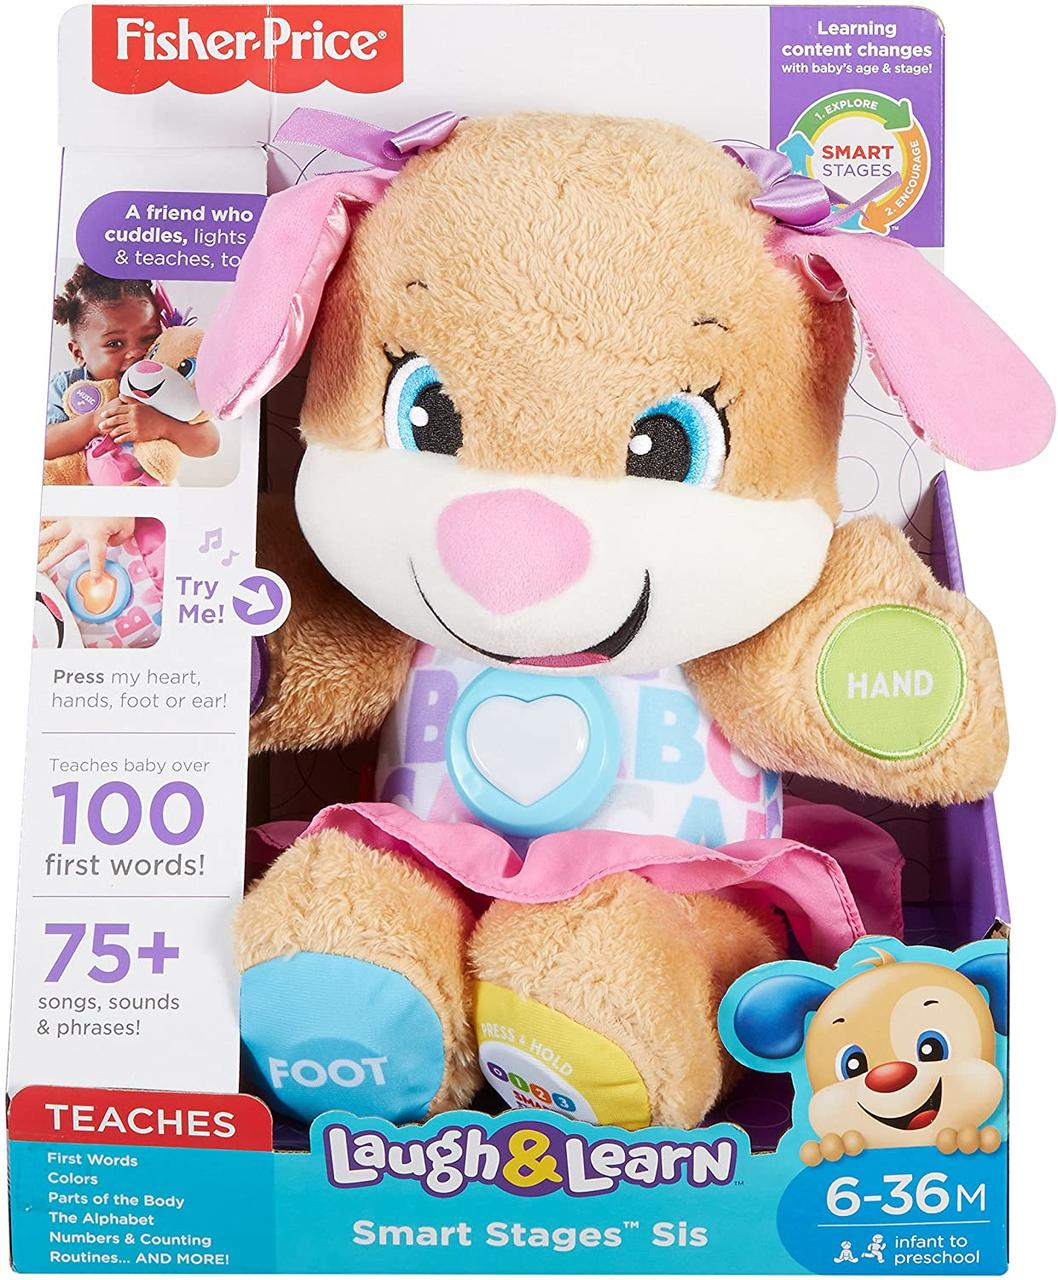 Интерактивная игрушка Умный щенок сестричка Фишер Прайс Fisher-Price Laugh & Learn puppy Sis